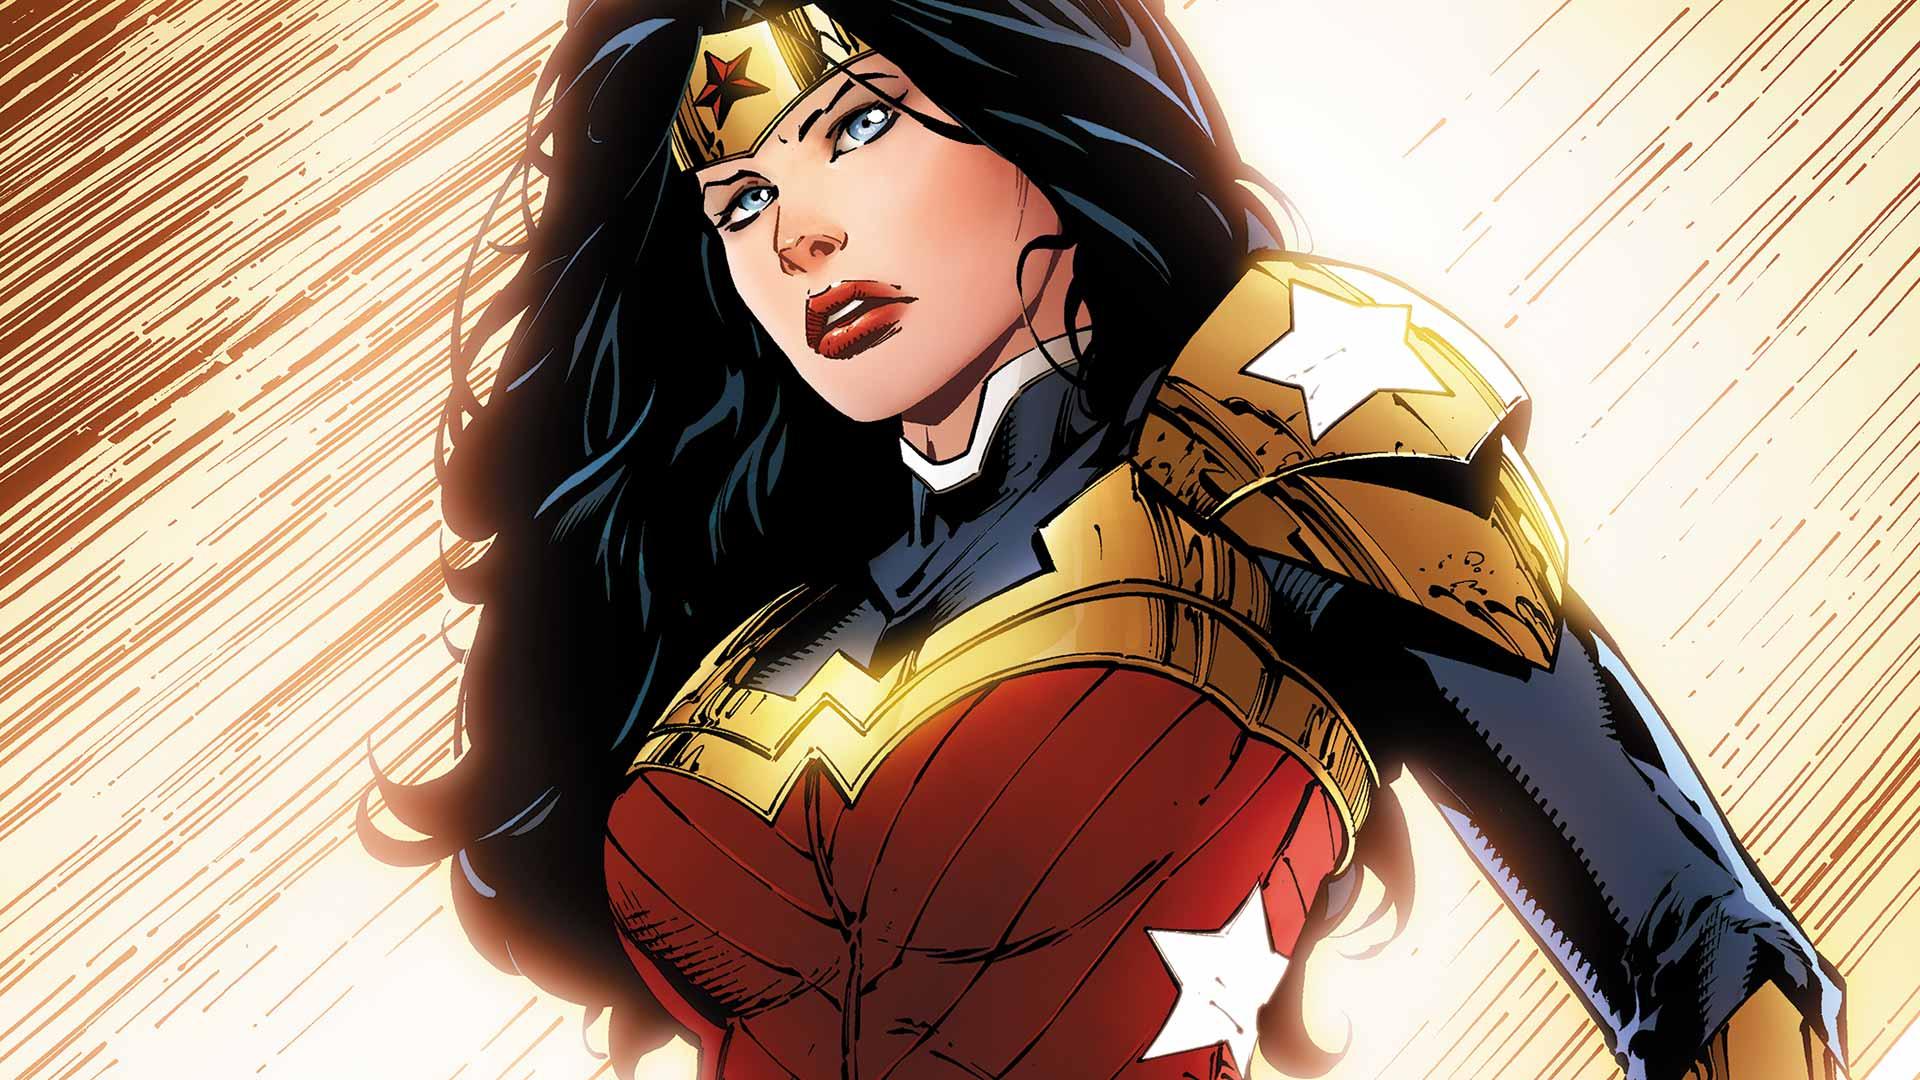 Wonder Woman Hq Movie Wallpapers: A Mulher Maravilha Foi Despedida Da ONU